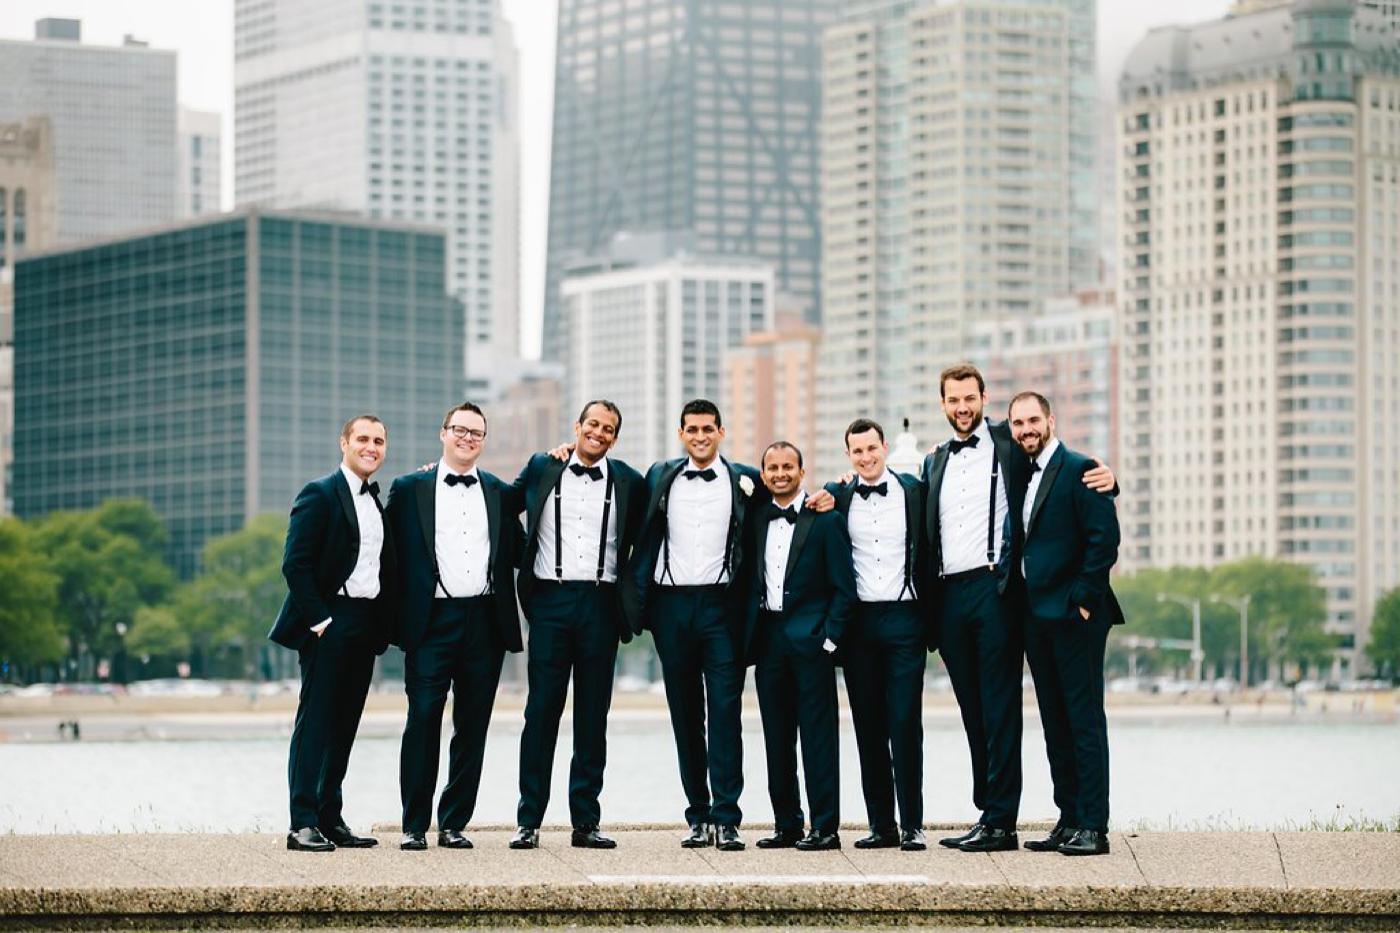 chicago-fine-art-wedding-photography-sakamuri31